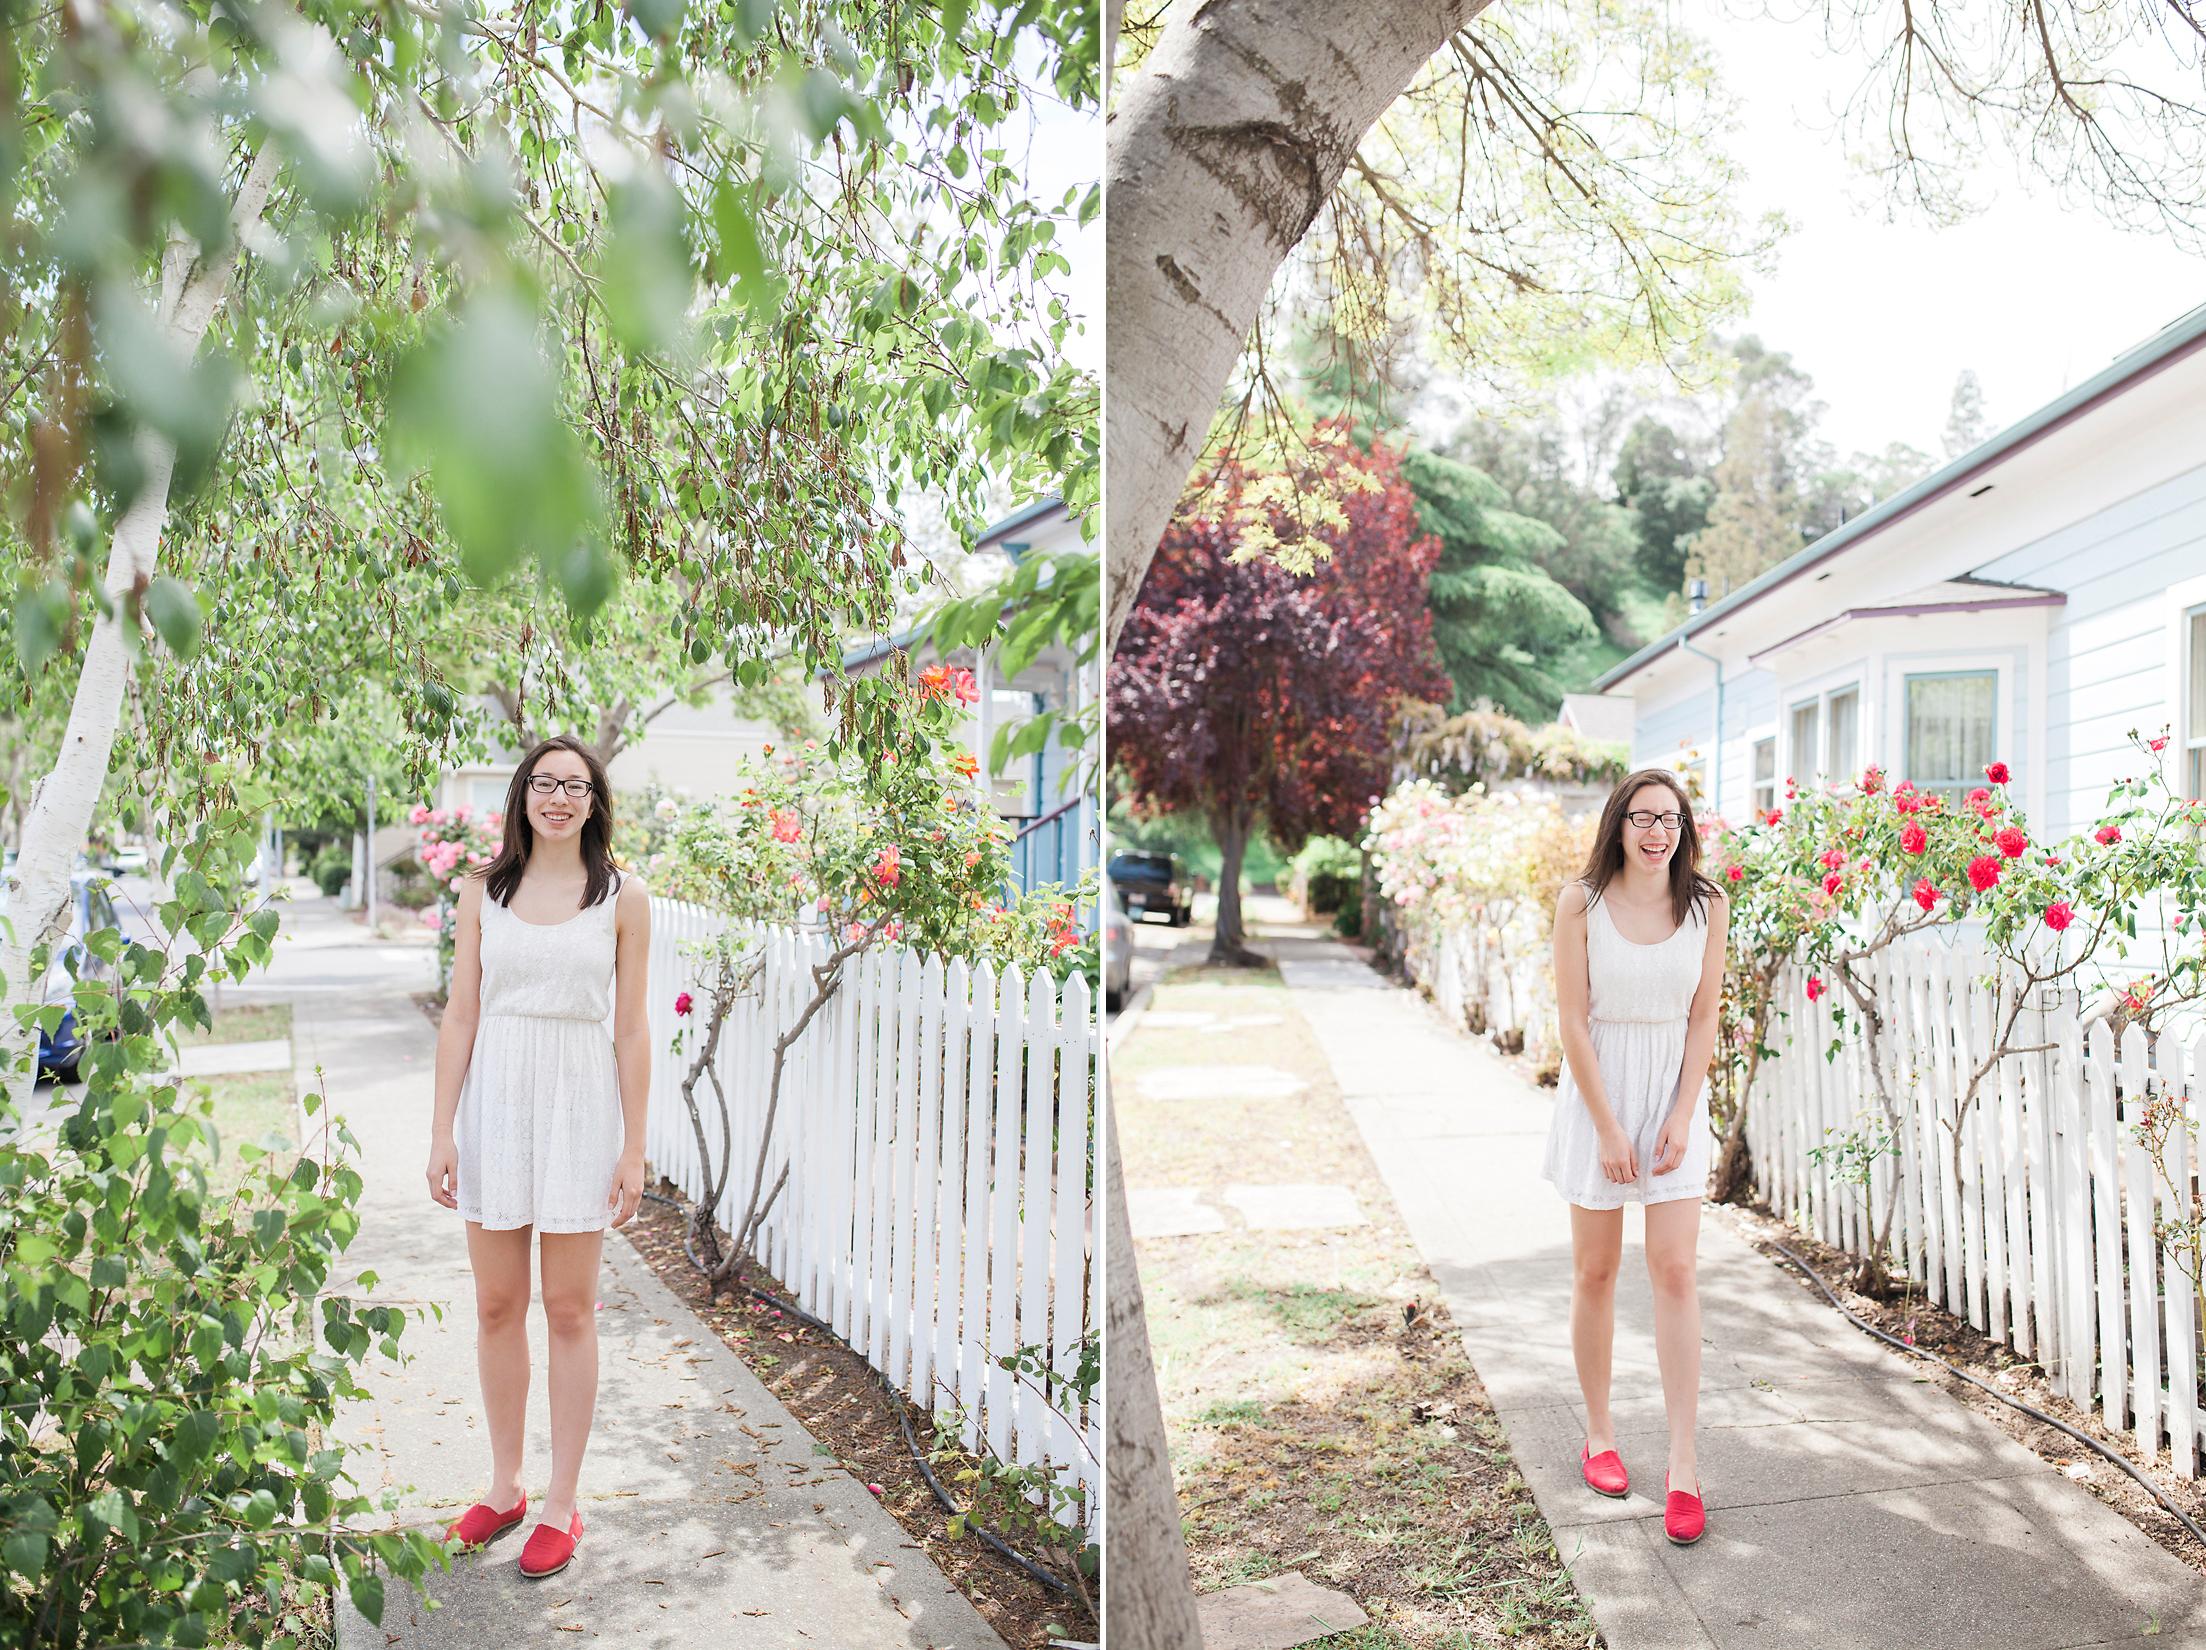 martinez_photographer_bay_area_senior_portraits_32.jpg